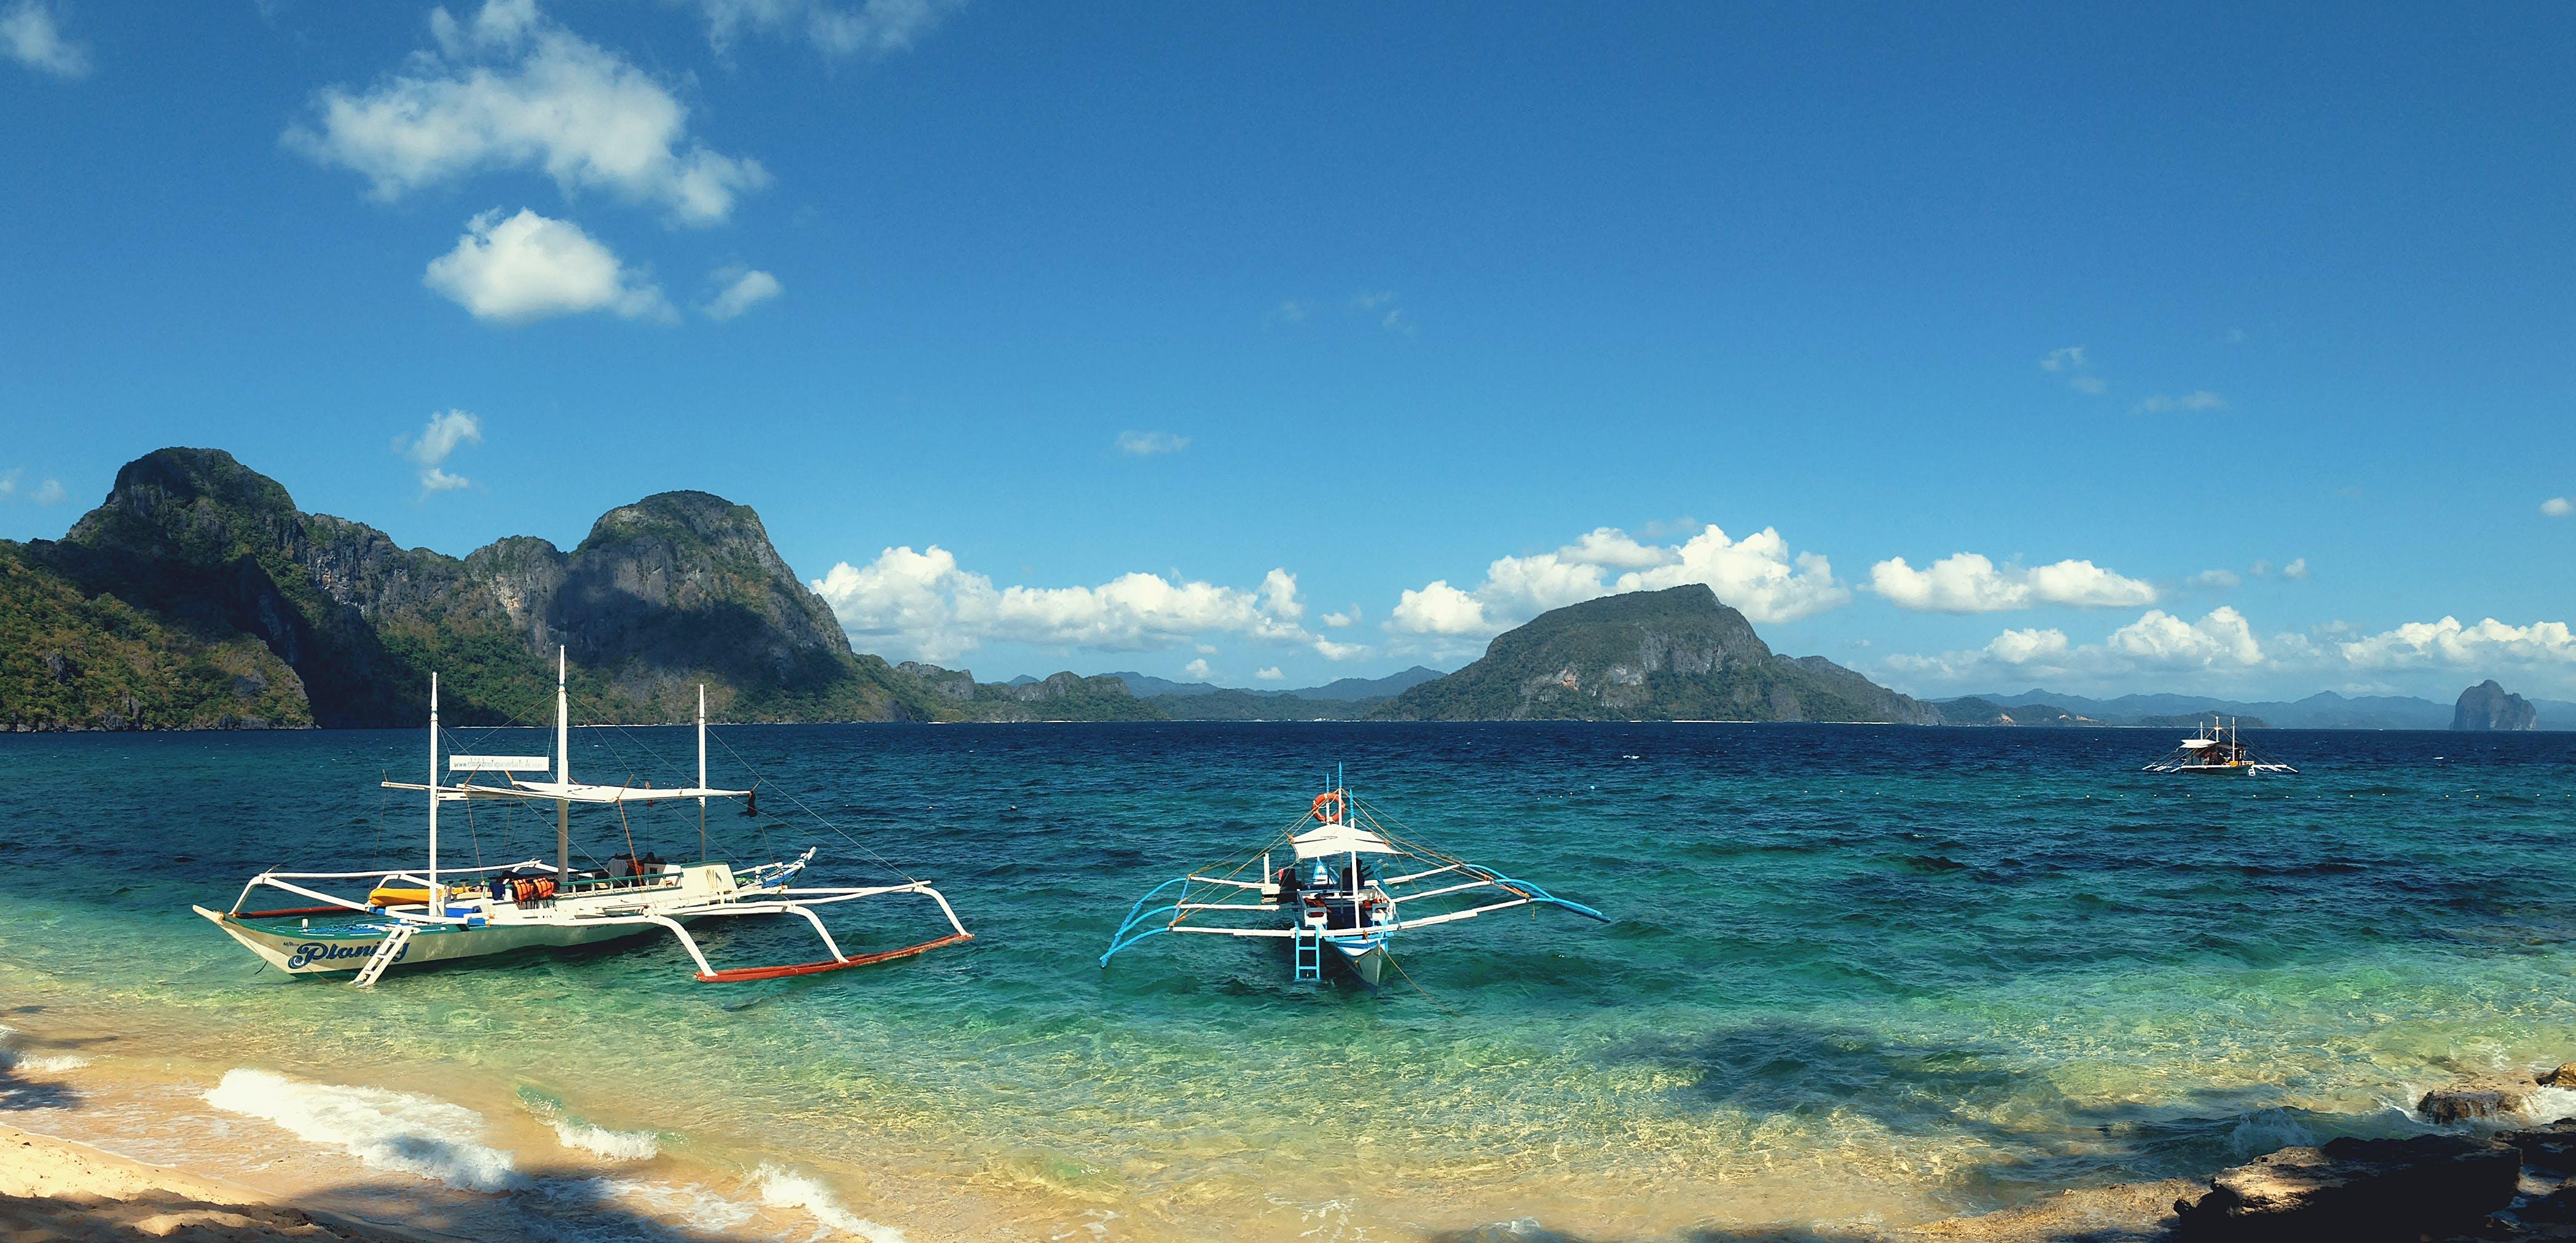 Gratis stockfoto met Azië, blauw water, eiland, strand